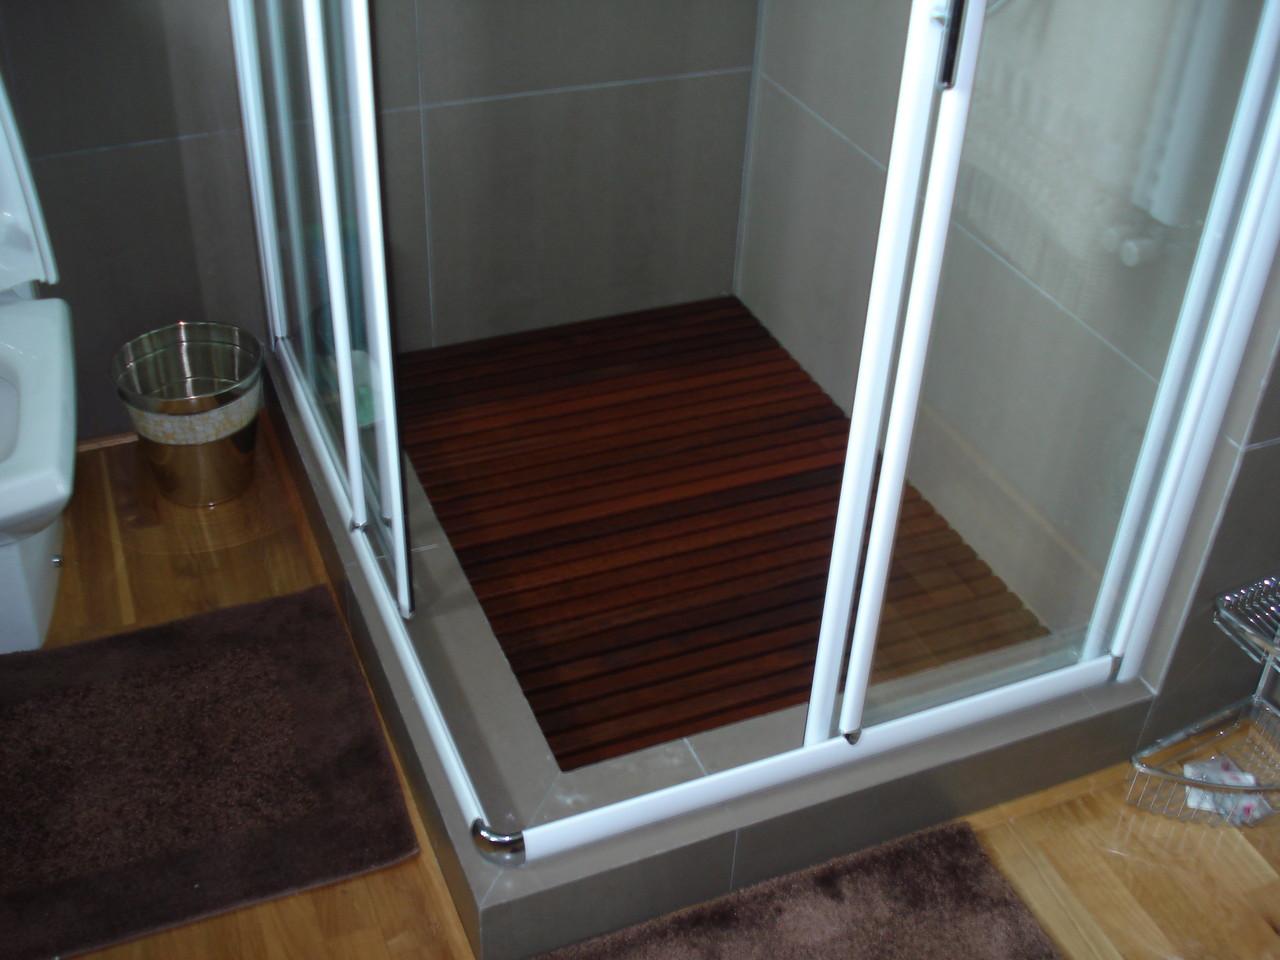 Deck De Madeira Chuveiro Box Banheiro Capacho 80x75 cm Sem Pintura Acabamento Lixado